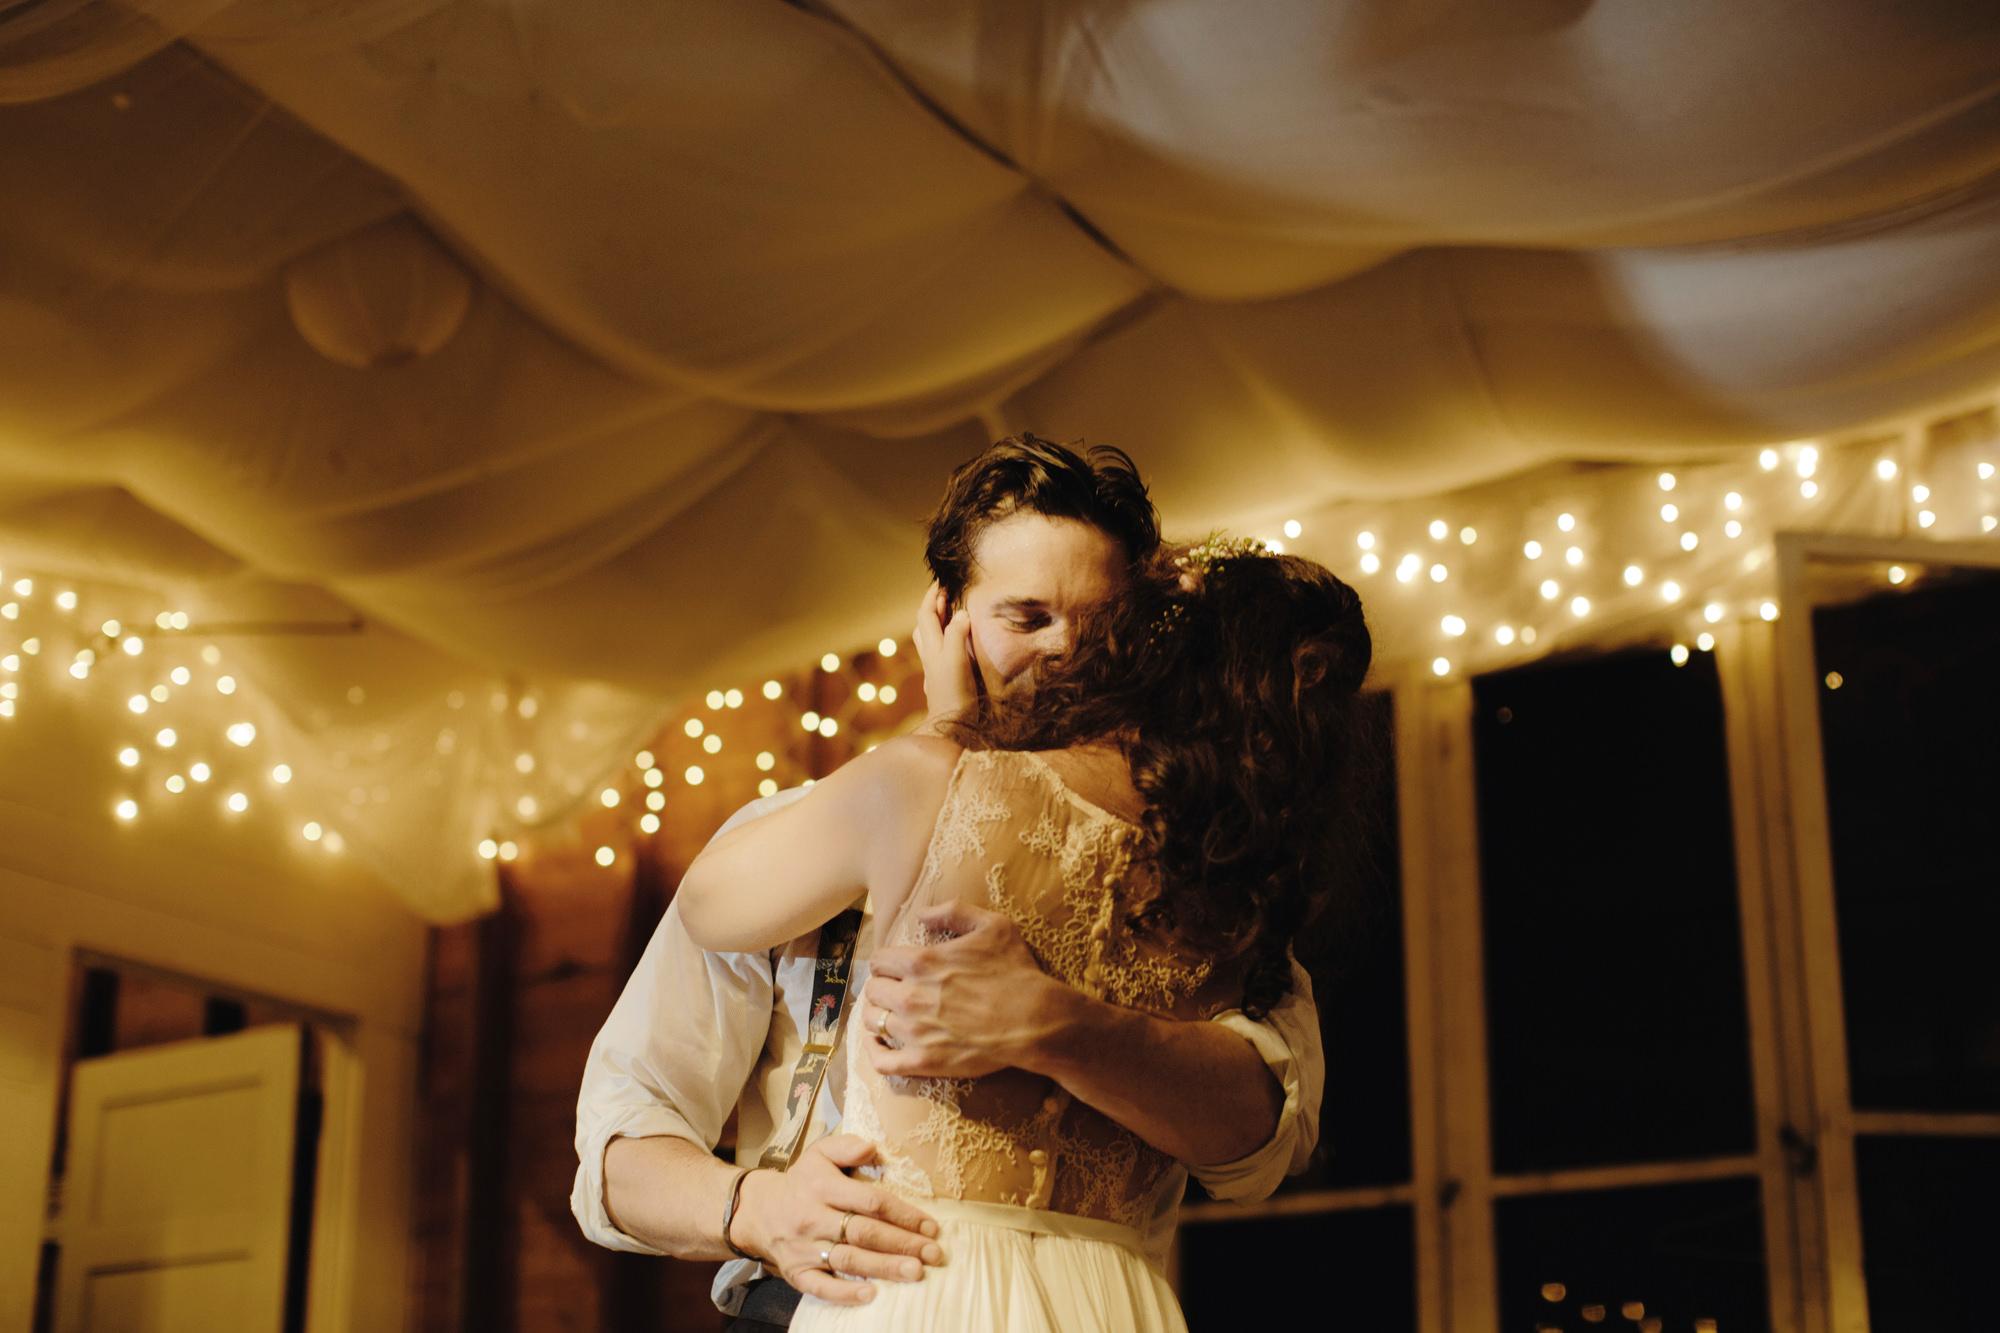 catskills_big_indian_springs_upstate_NY_wedding_sammblake159.jpg